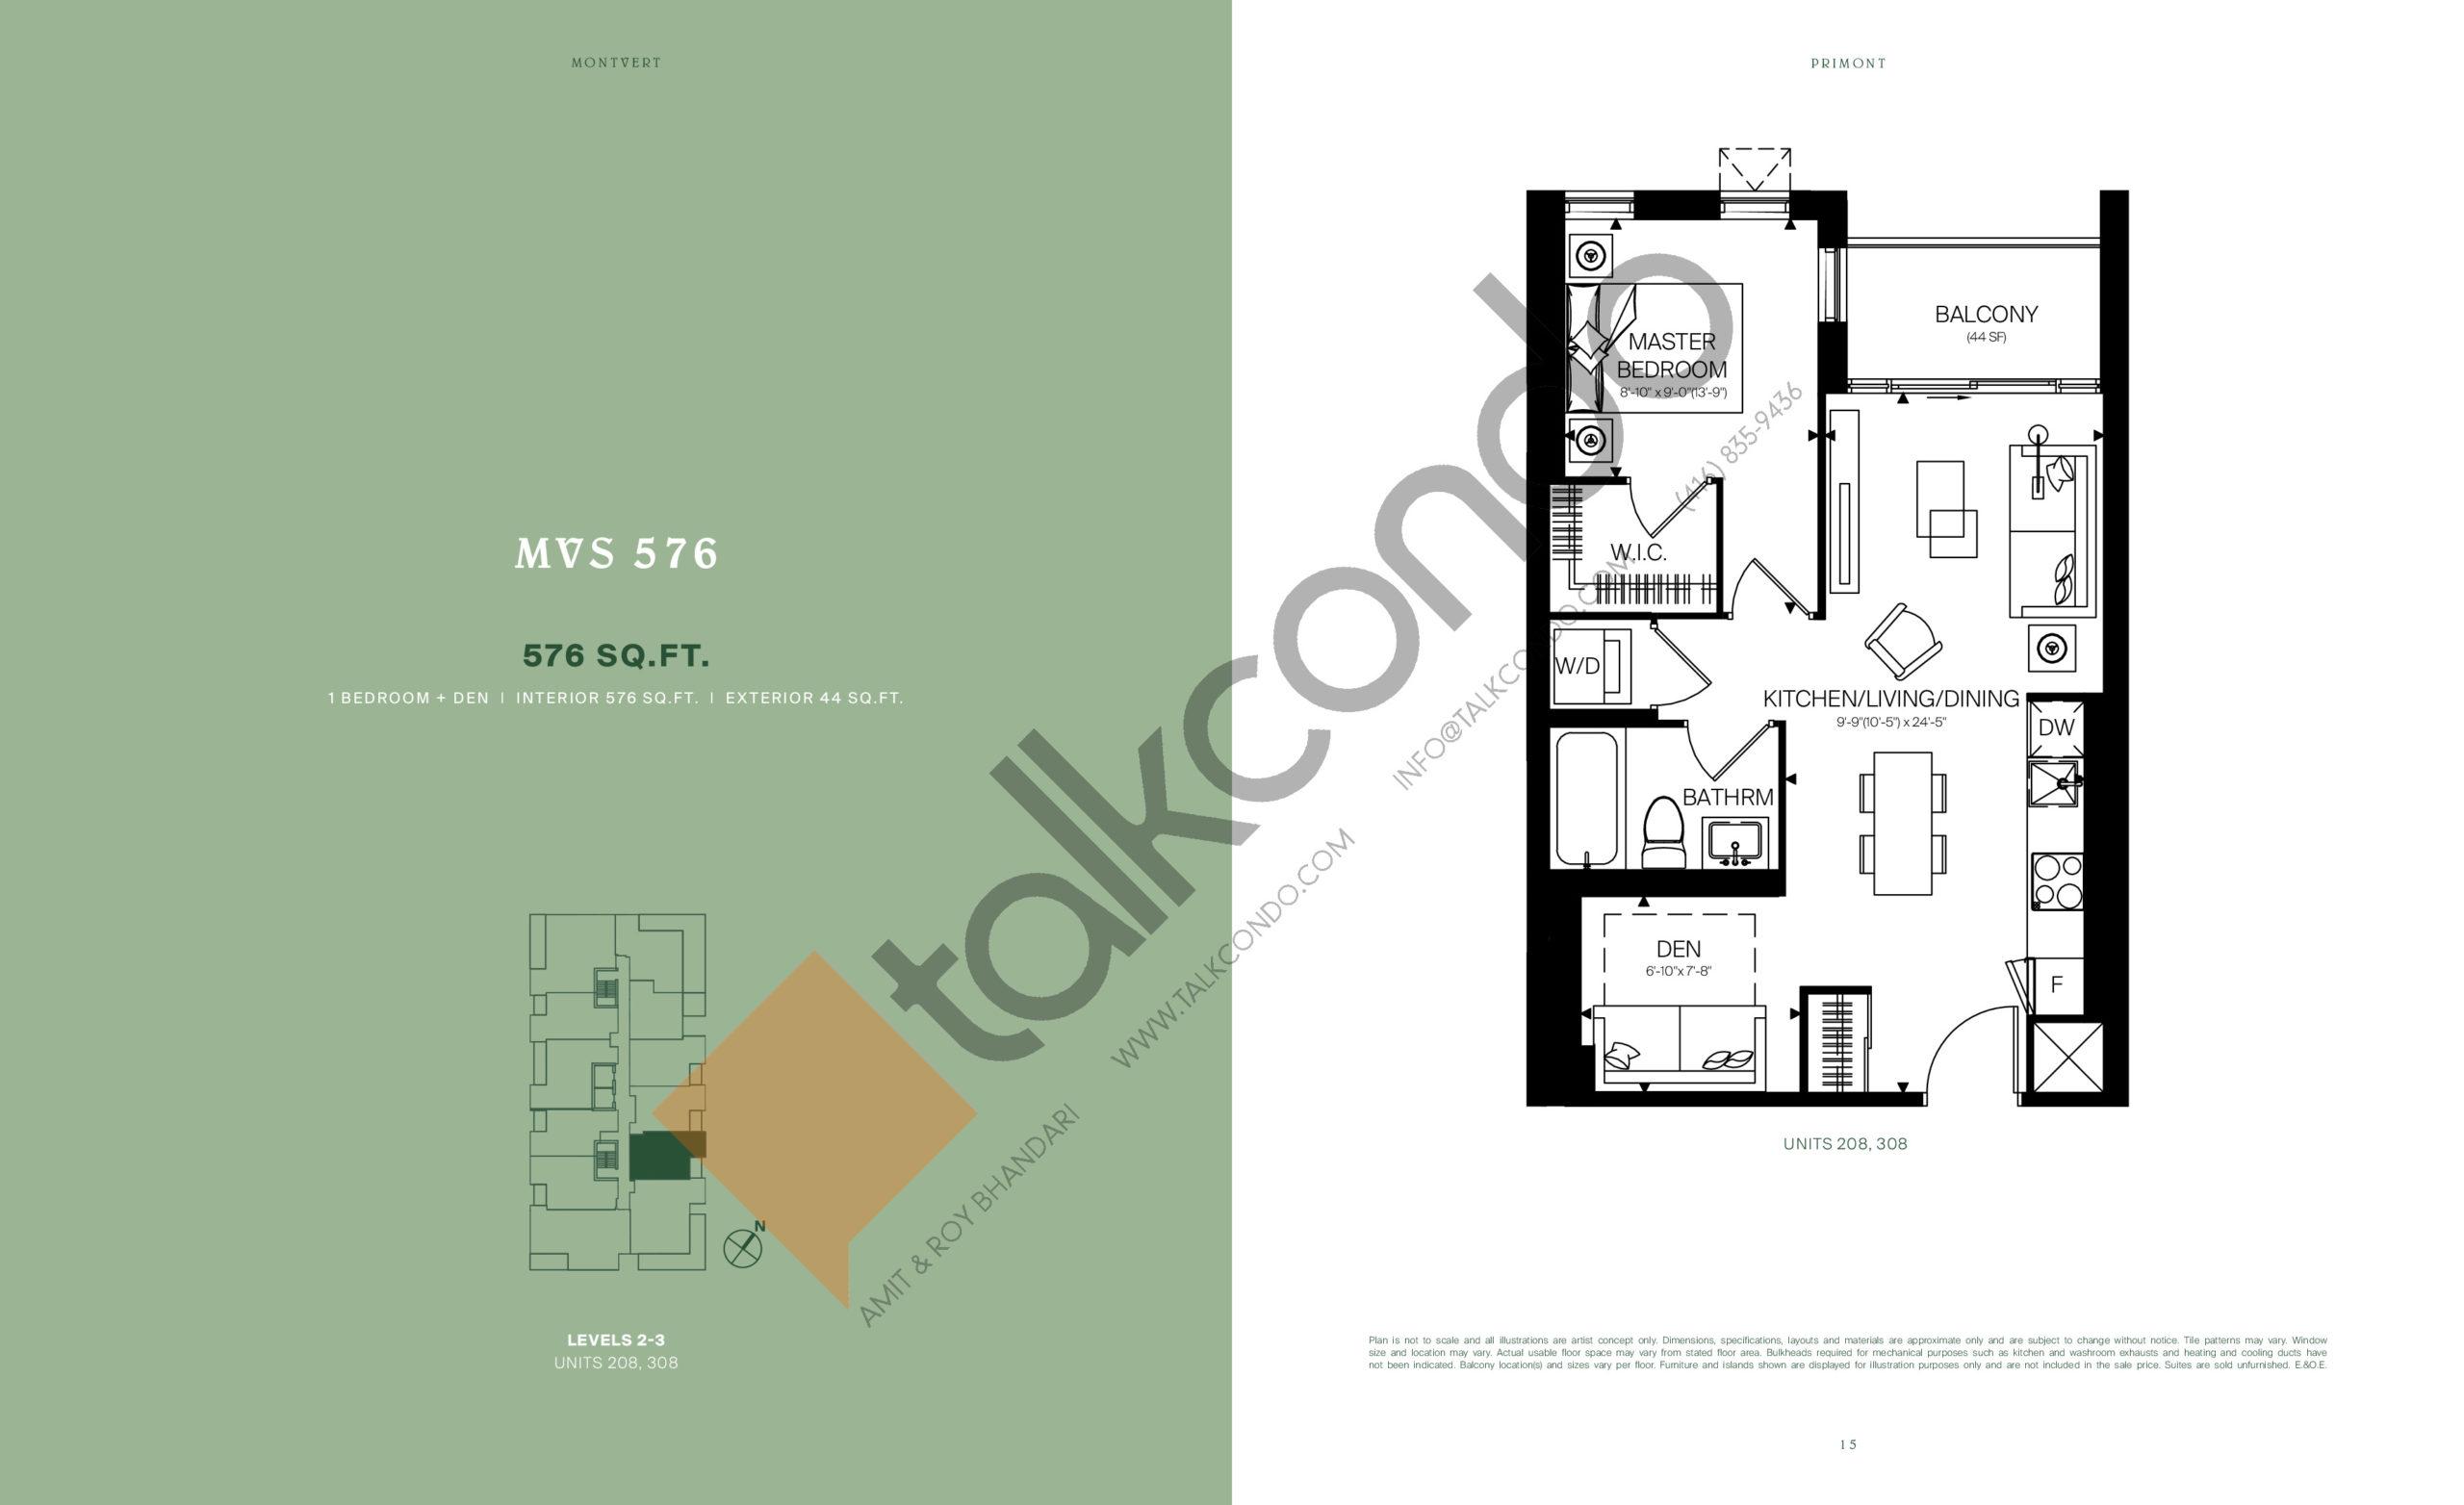 MVS 576 Floor Plan at MontVert Condos - 576 sq.ft